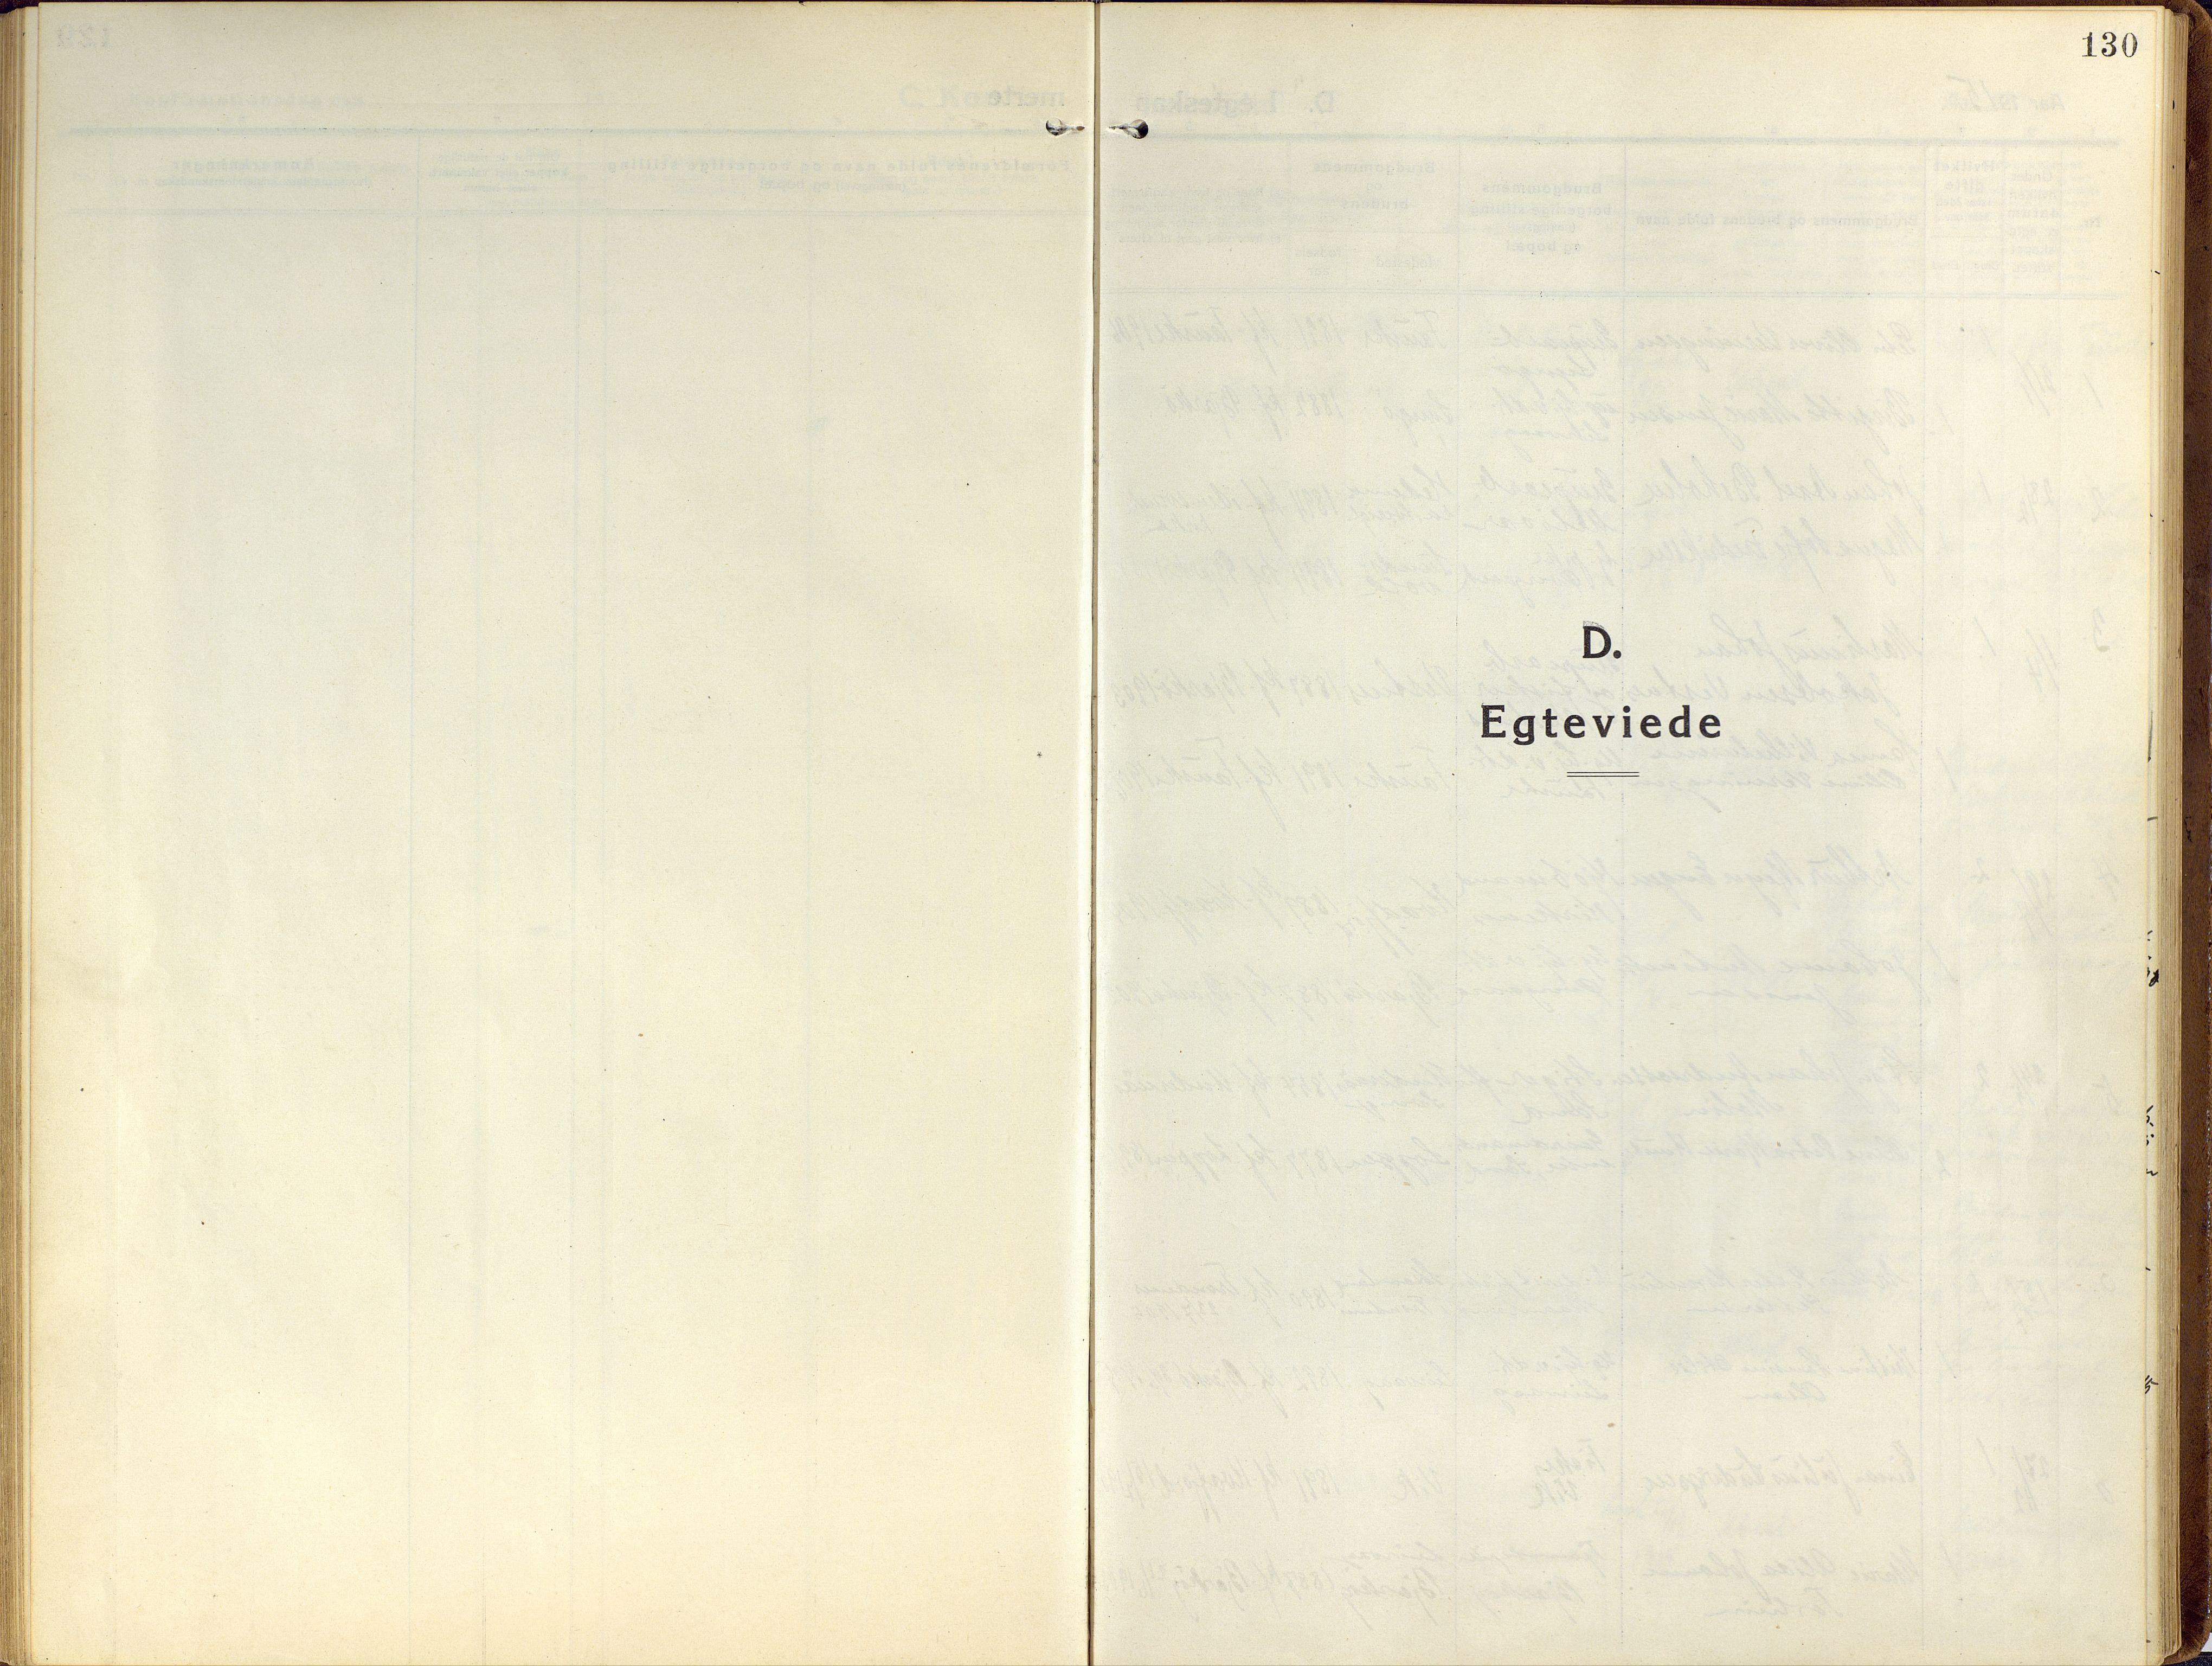 SATØ, Sand/Bjarkøy sokneprestkontor, I/Ia/Iaa/L0006kirke: Ministerialbok nr. 6, 1915-1929, s. 130